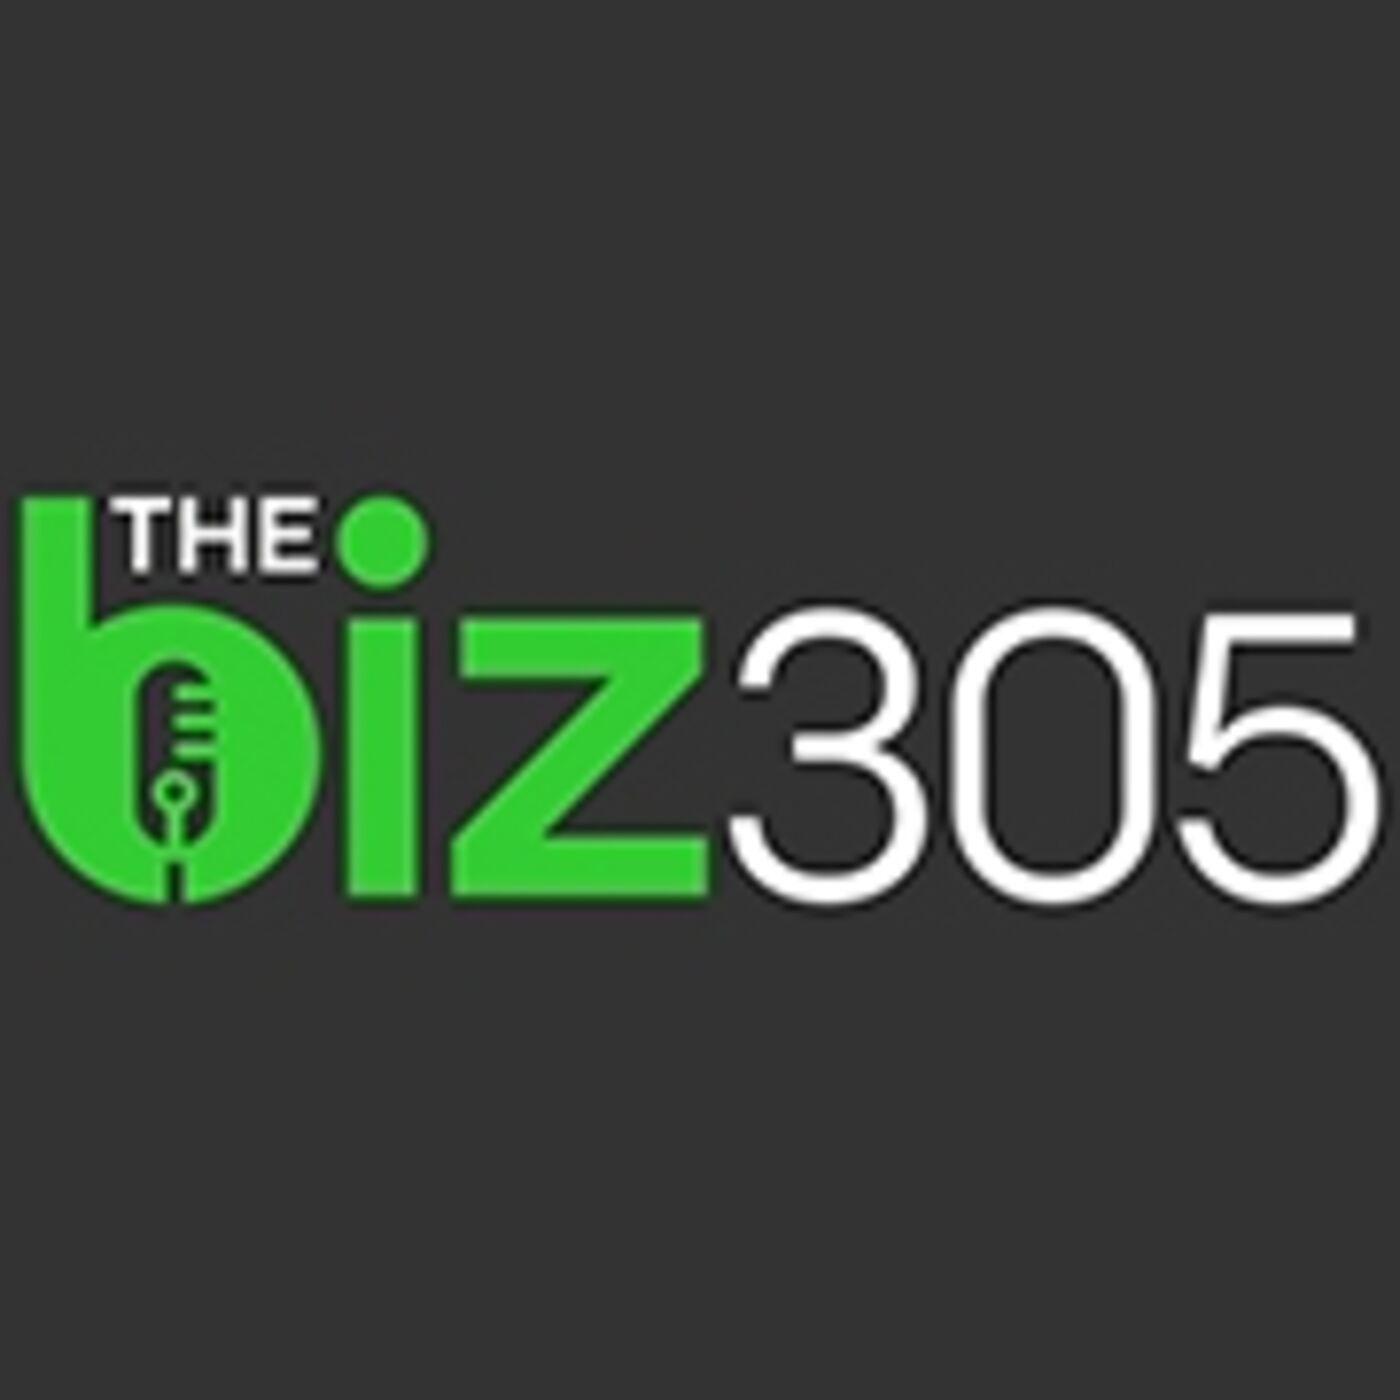 BIZ 305 features Ojala Wine - Ace Cruz   Whilly Bermudez